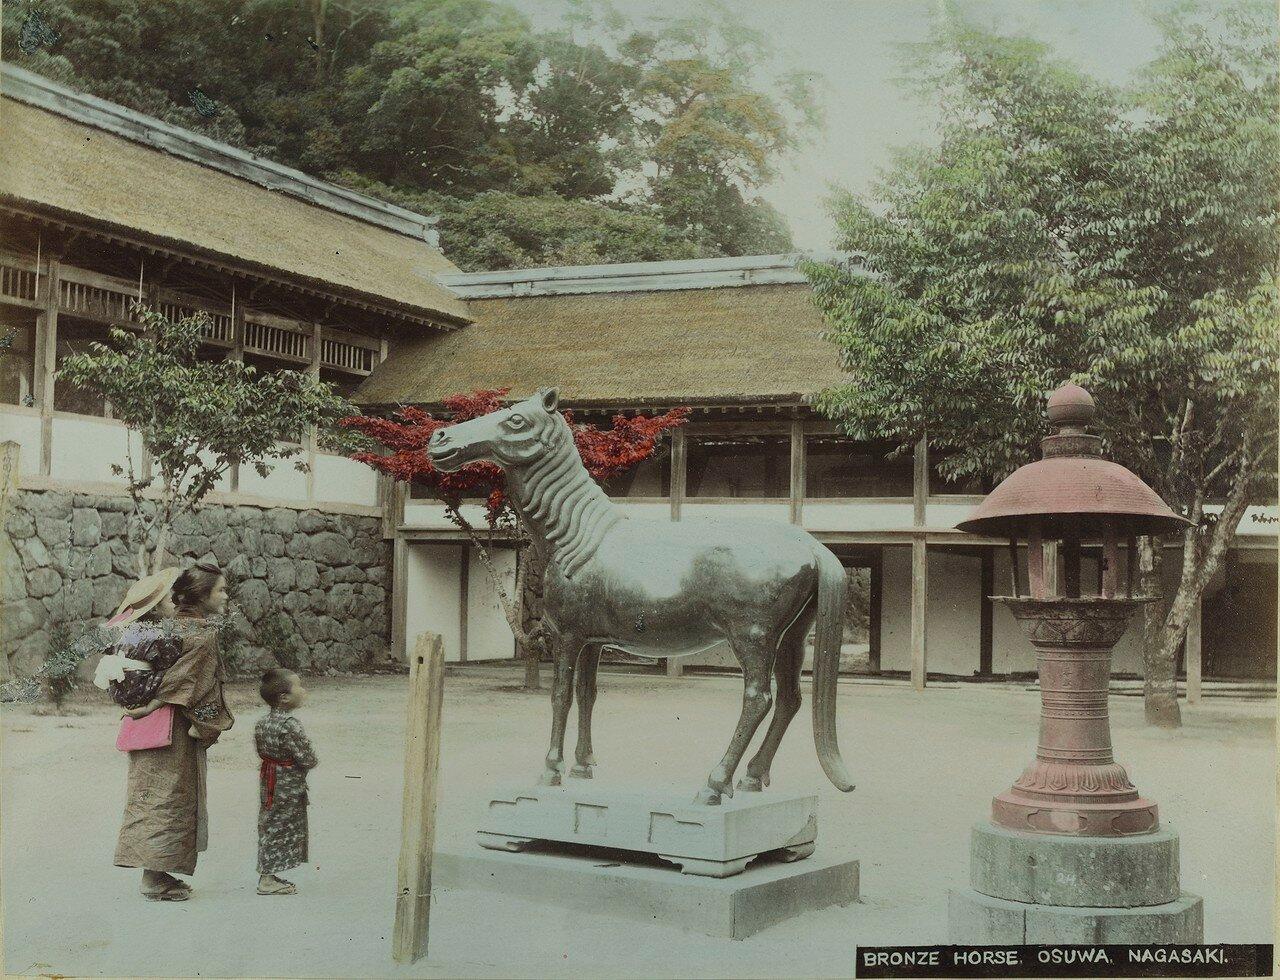 Нагасаки. Храм Осува Нара. Бронзовая лошадь